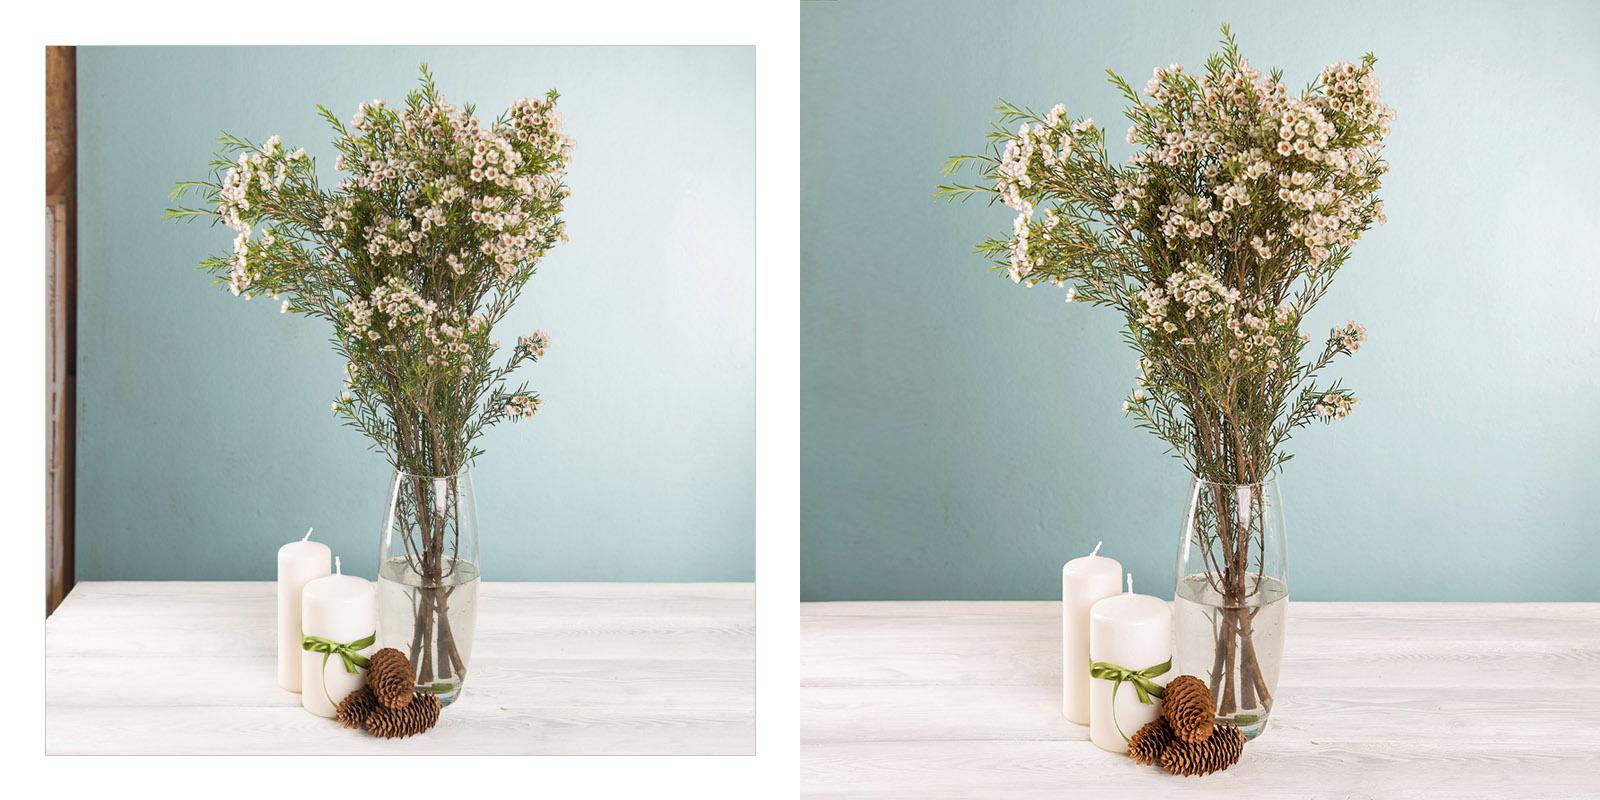 Цветы. Цветокоррекция, ретушь. (2)